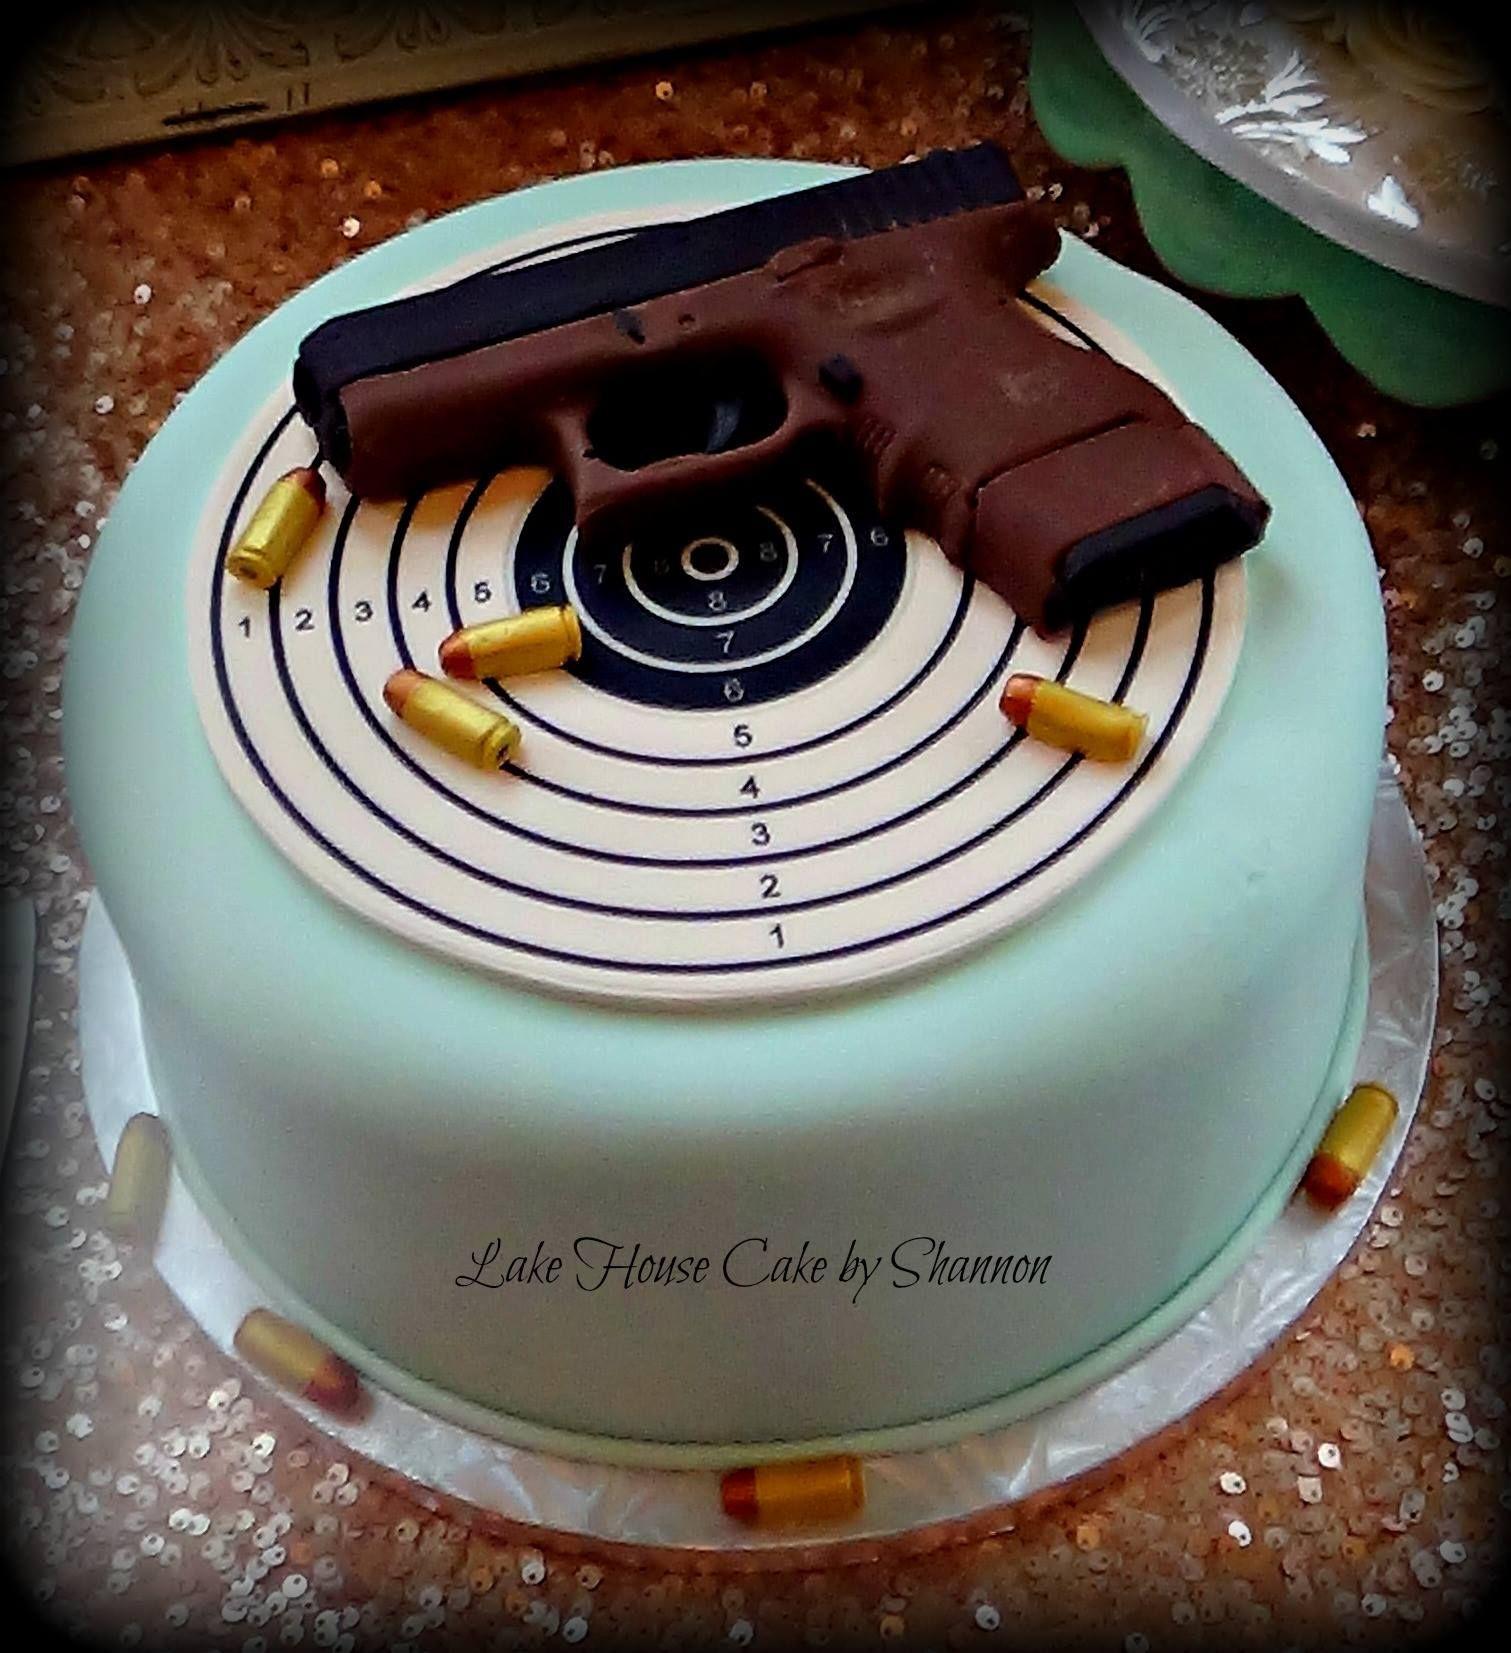 Grooms Wedding Cake Ideas: Groom's Cake, Target, Glock Cake, Handgun, Hand Gun